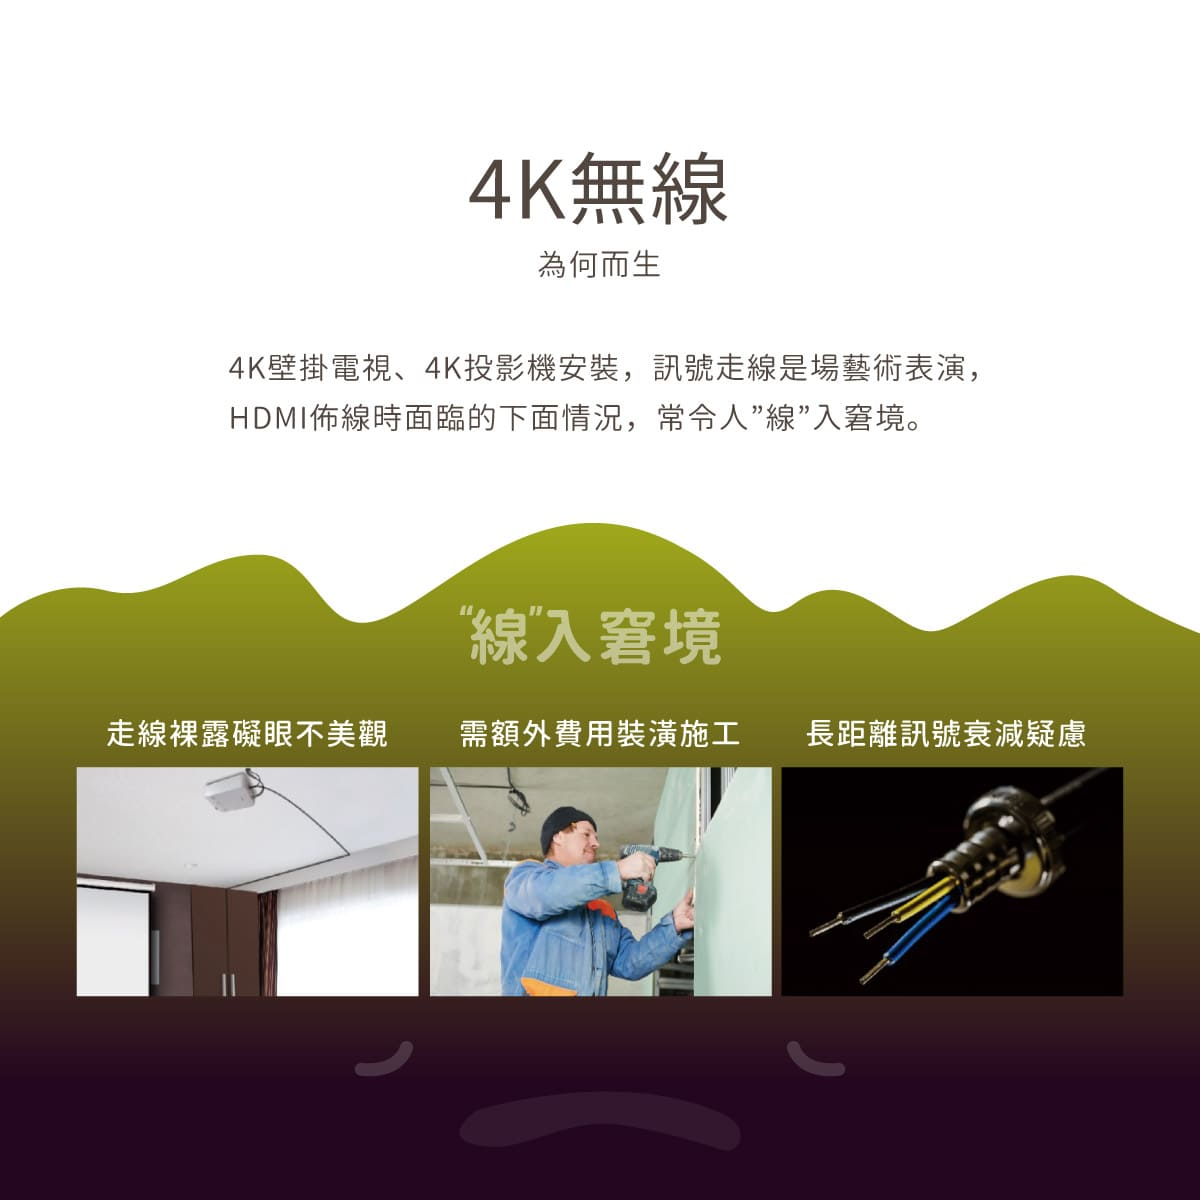 proimages/product/HDMI/WTR-4KS/02.jpg